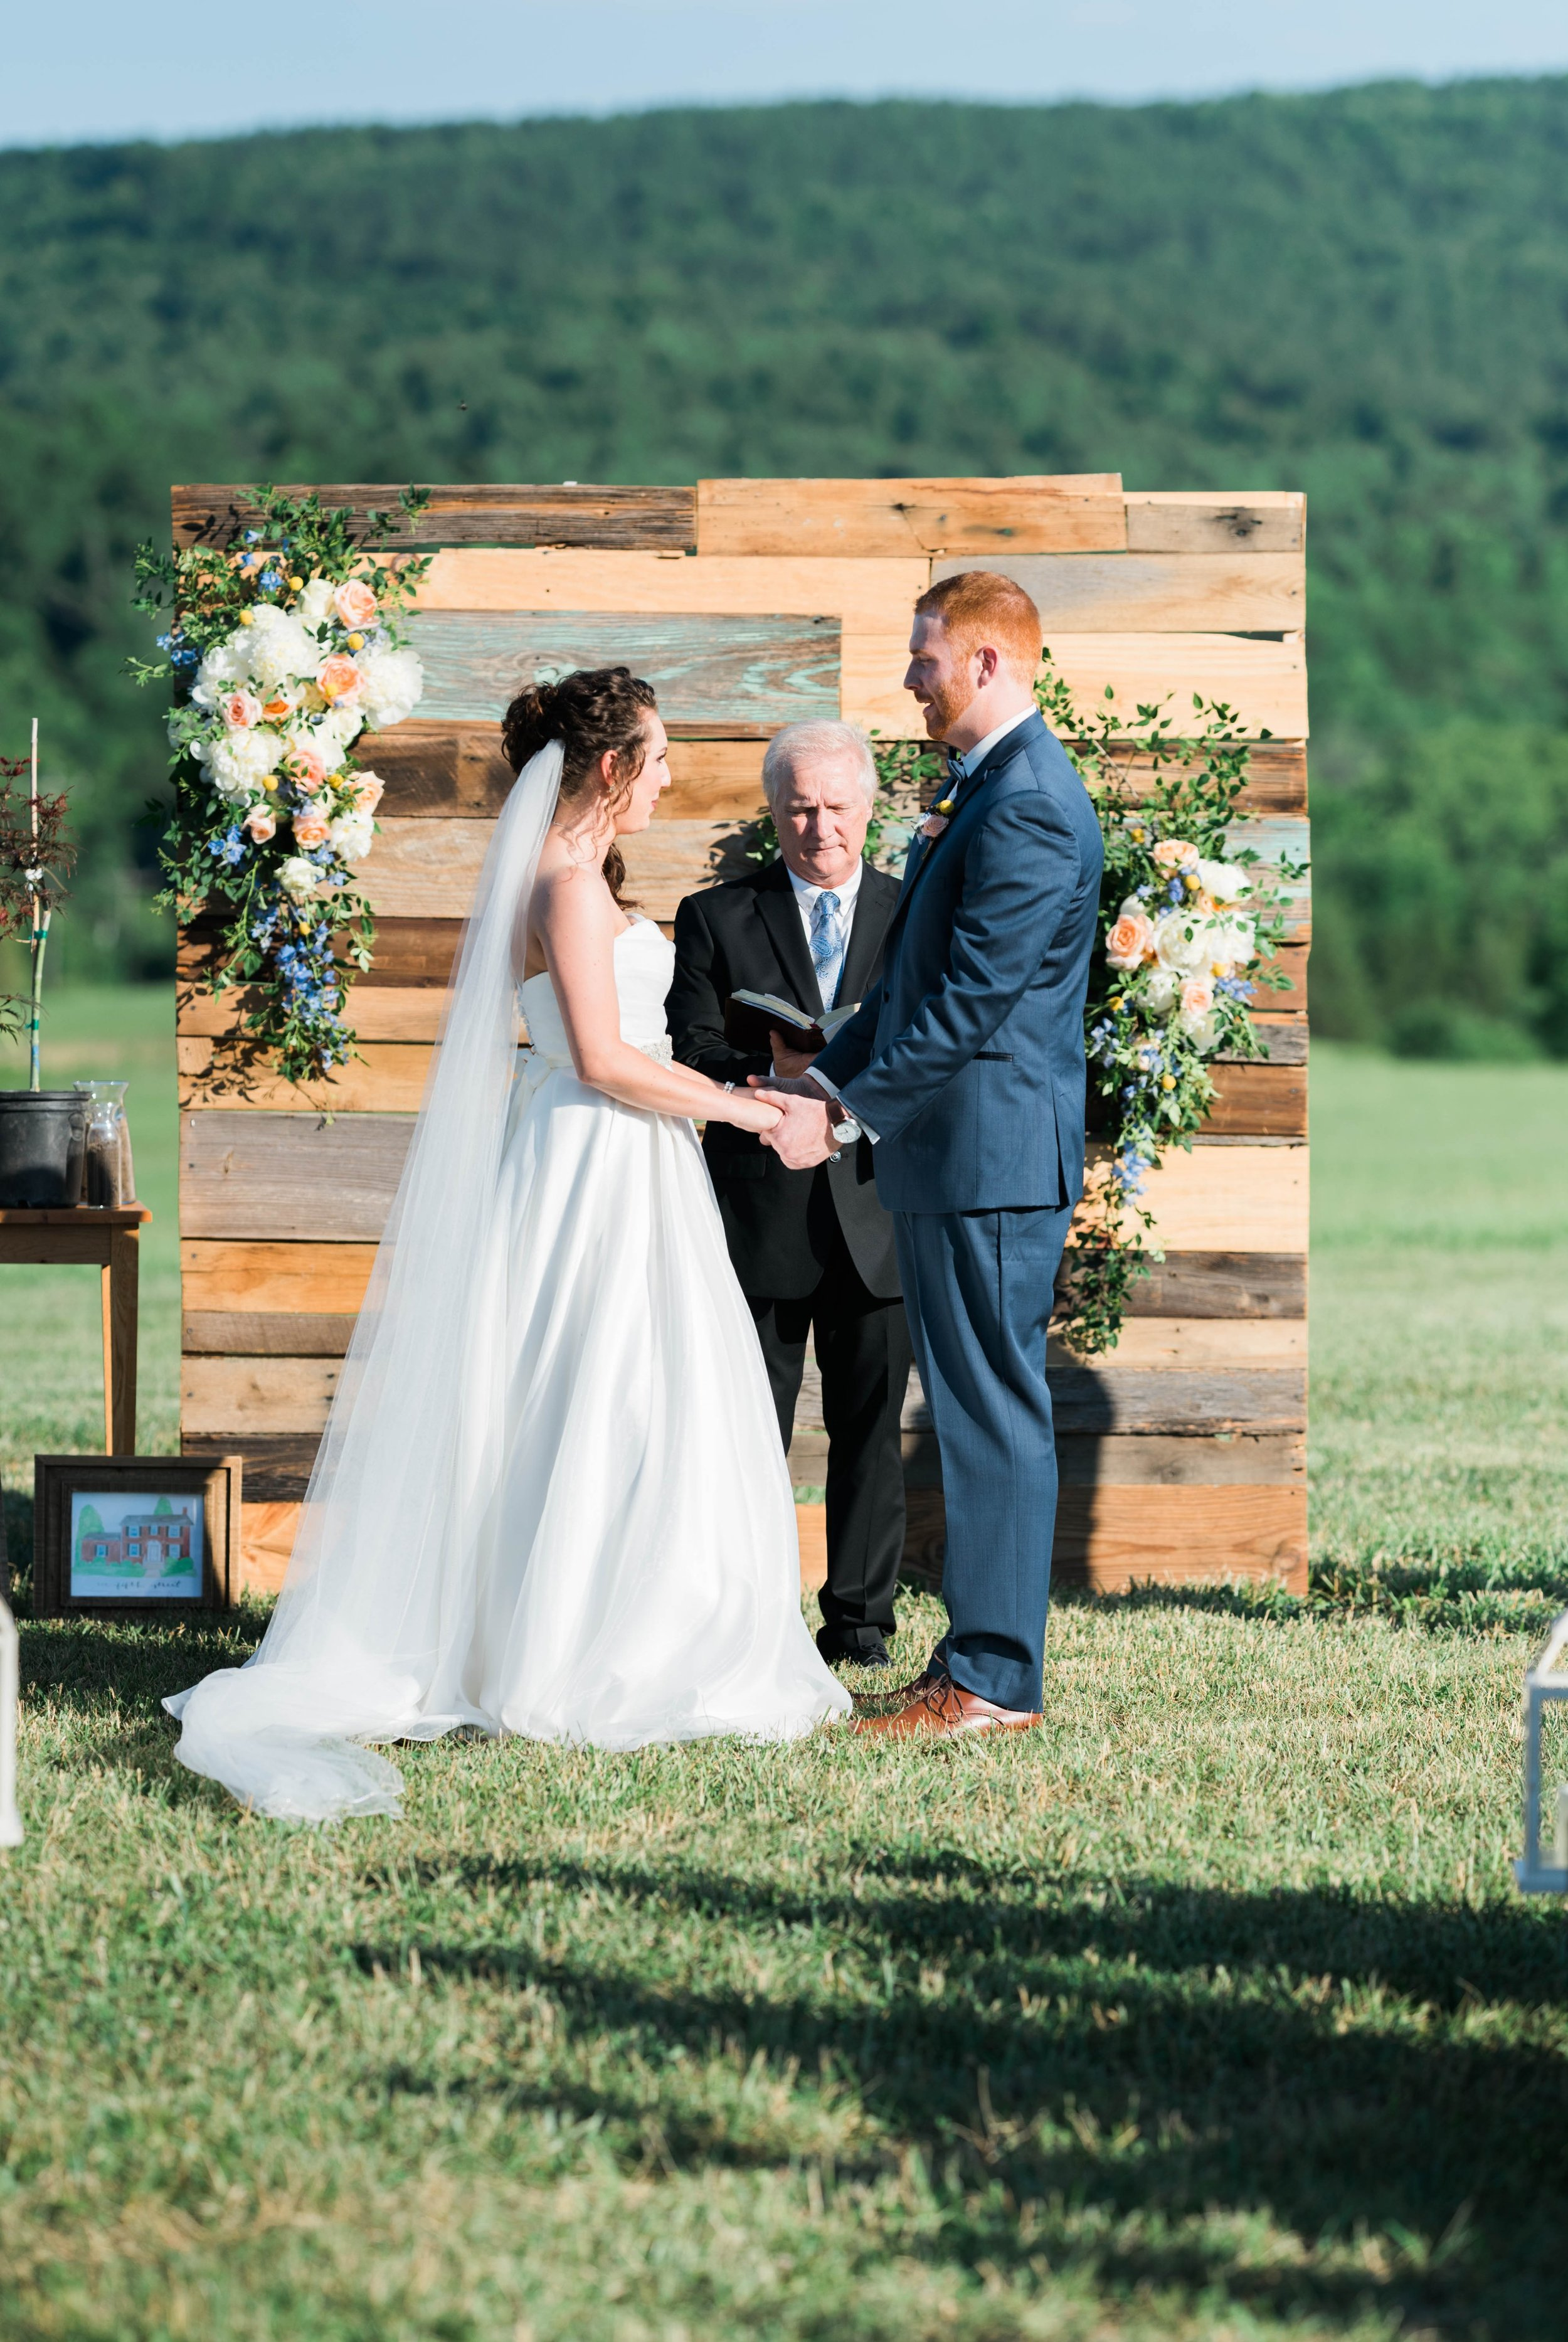 SorellaFarms_EvingtonVA_Lynchburgweddingphotographer_VirginiaweddingPhotographer_AshleyAndrewSorellaFarmsWedding 44.jpg